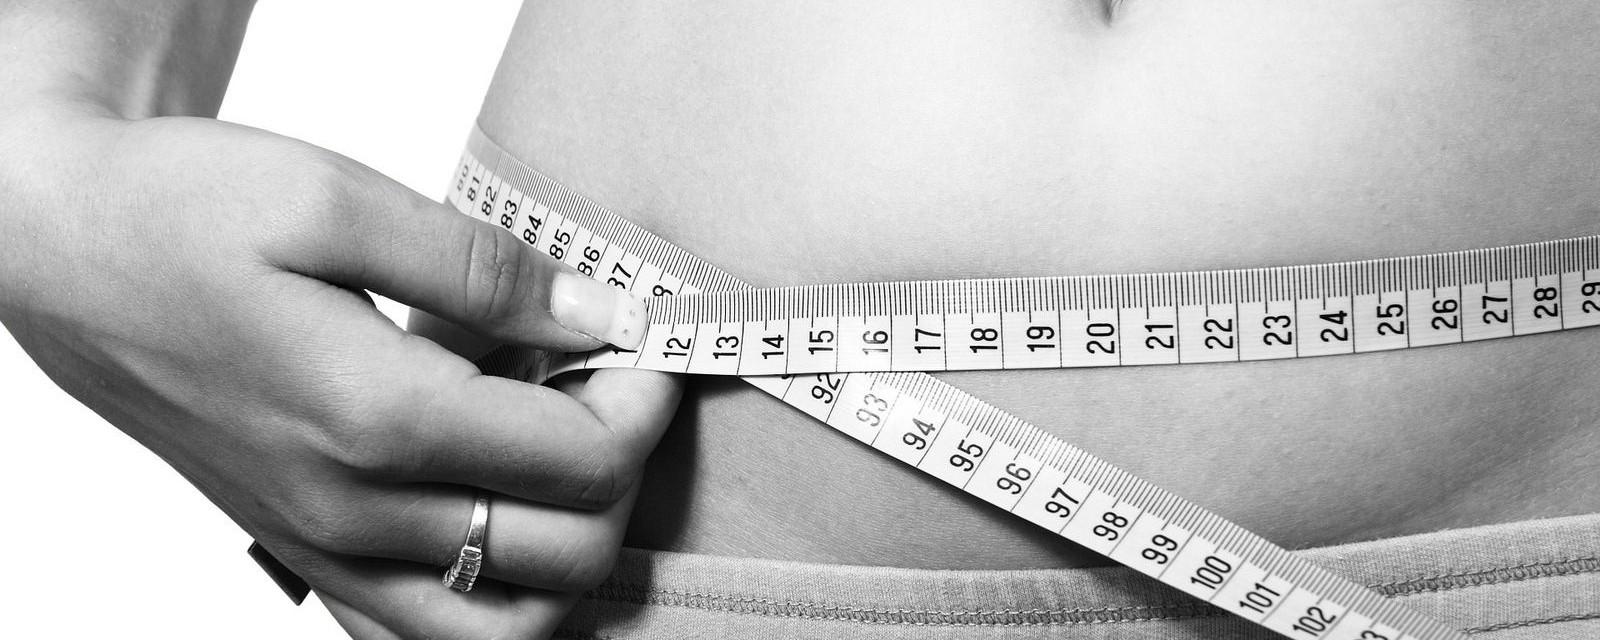 Dieta. Slabit. Controlul greutatii. Supraponderalitate. Obezitate